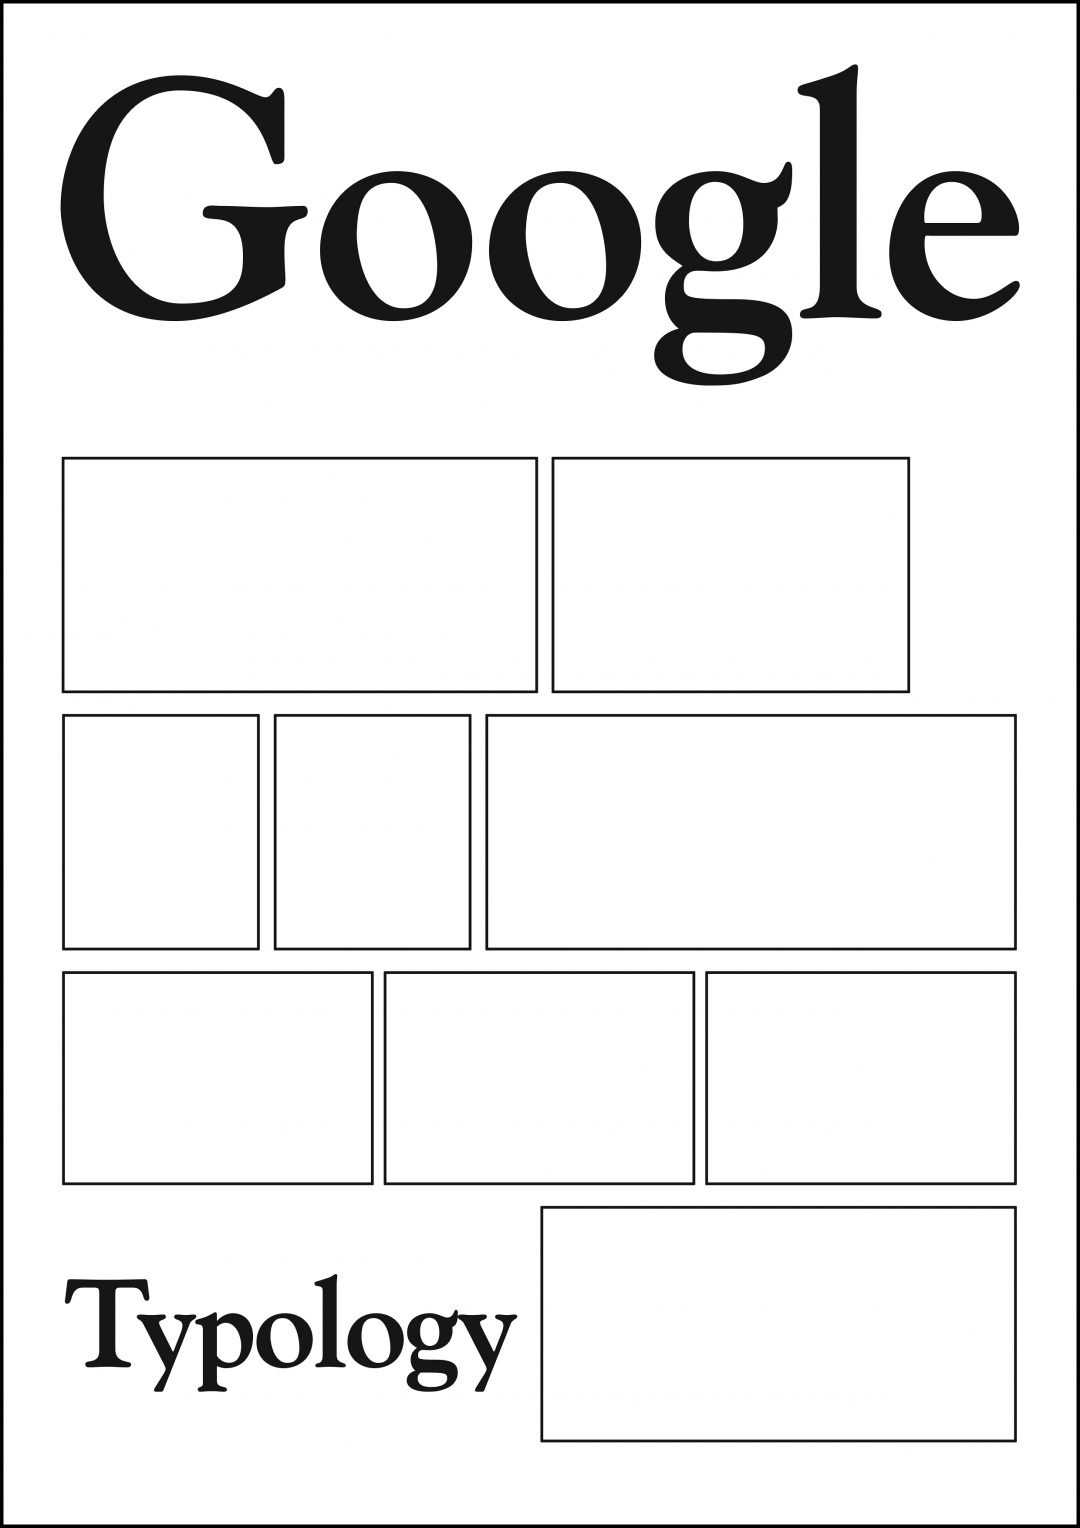 Google Typology